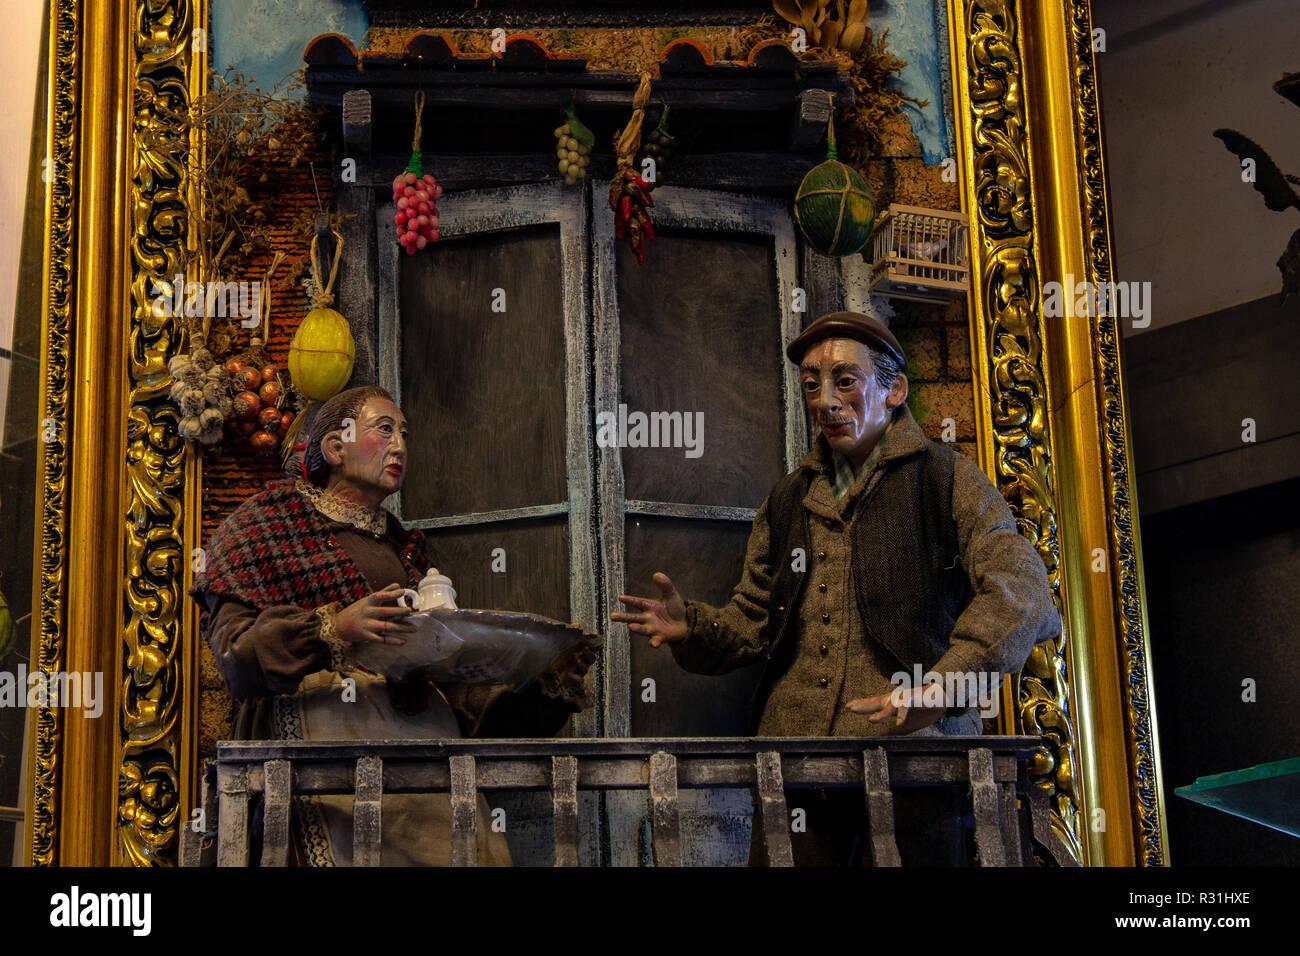 Naples, San Greorio Armeno, scene of a play represented in Neapolitan presepial shepherds. 03/11/2018 - Stock Image